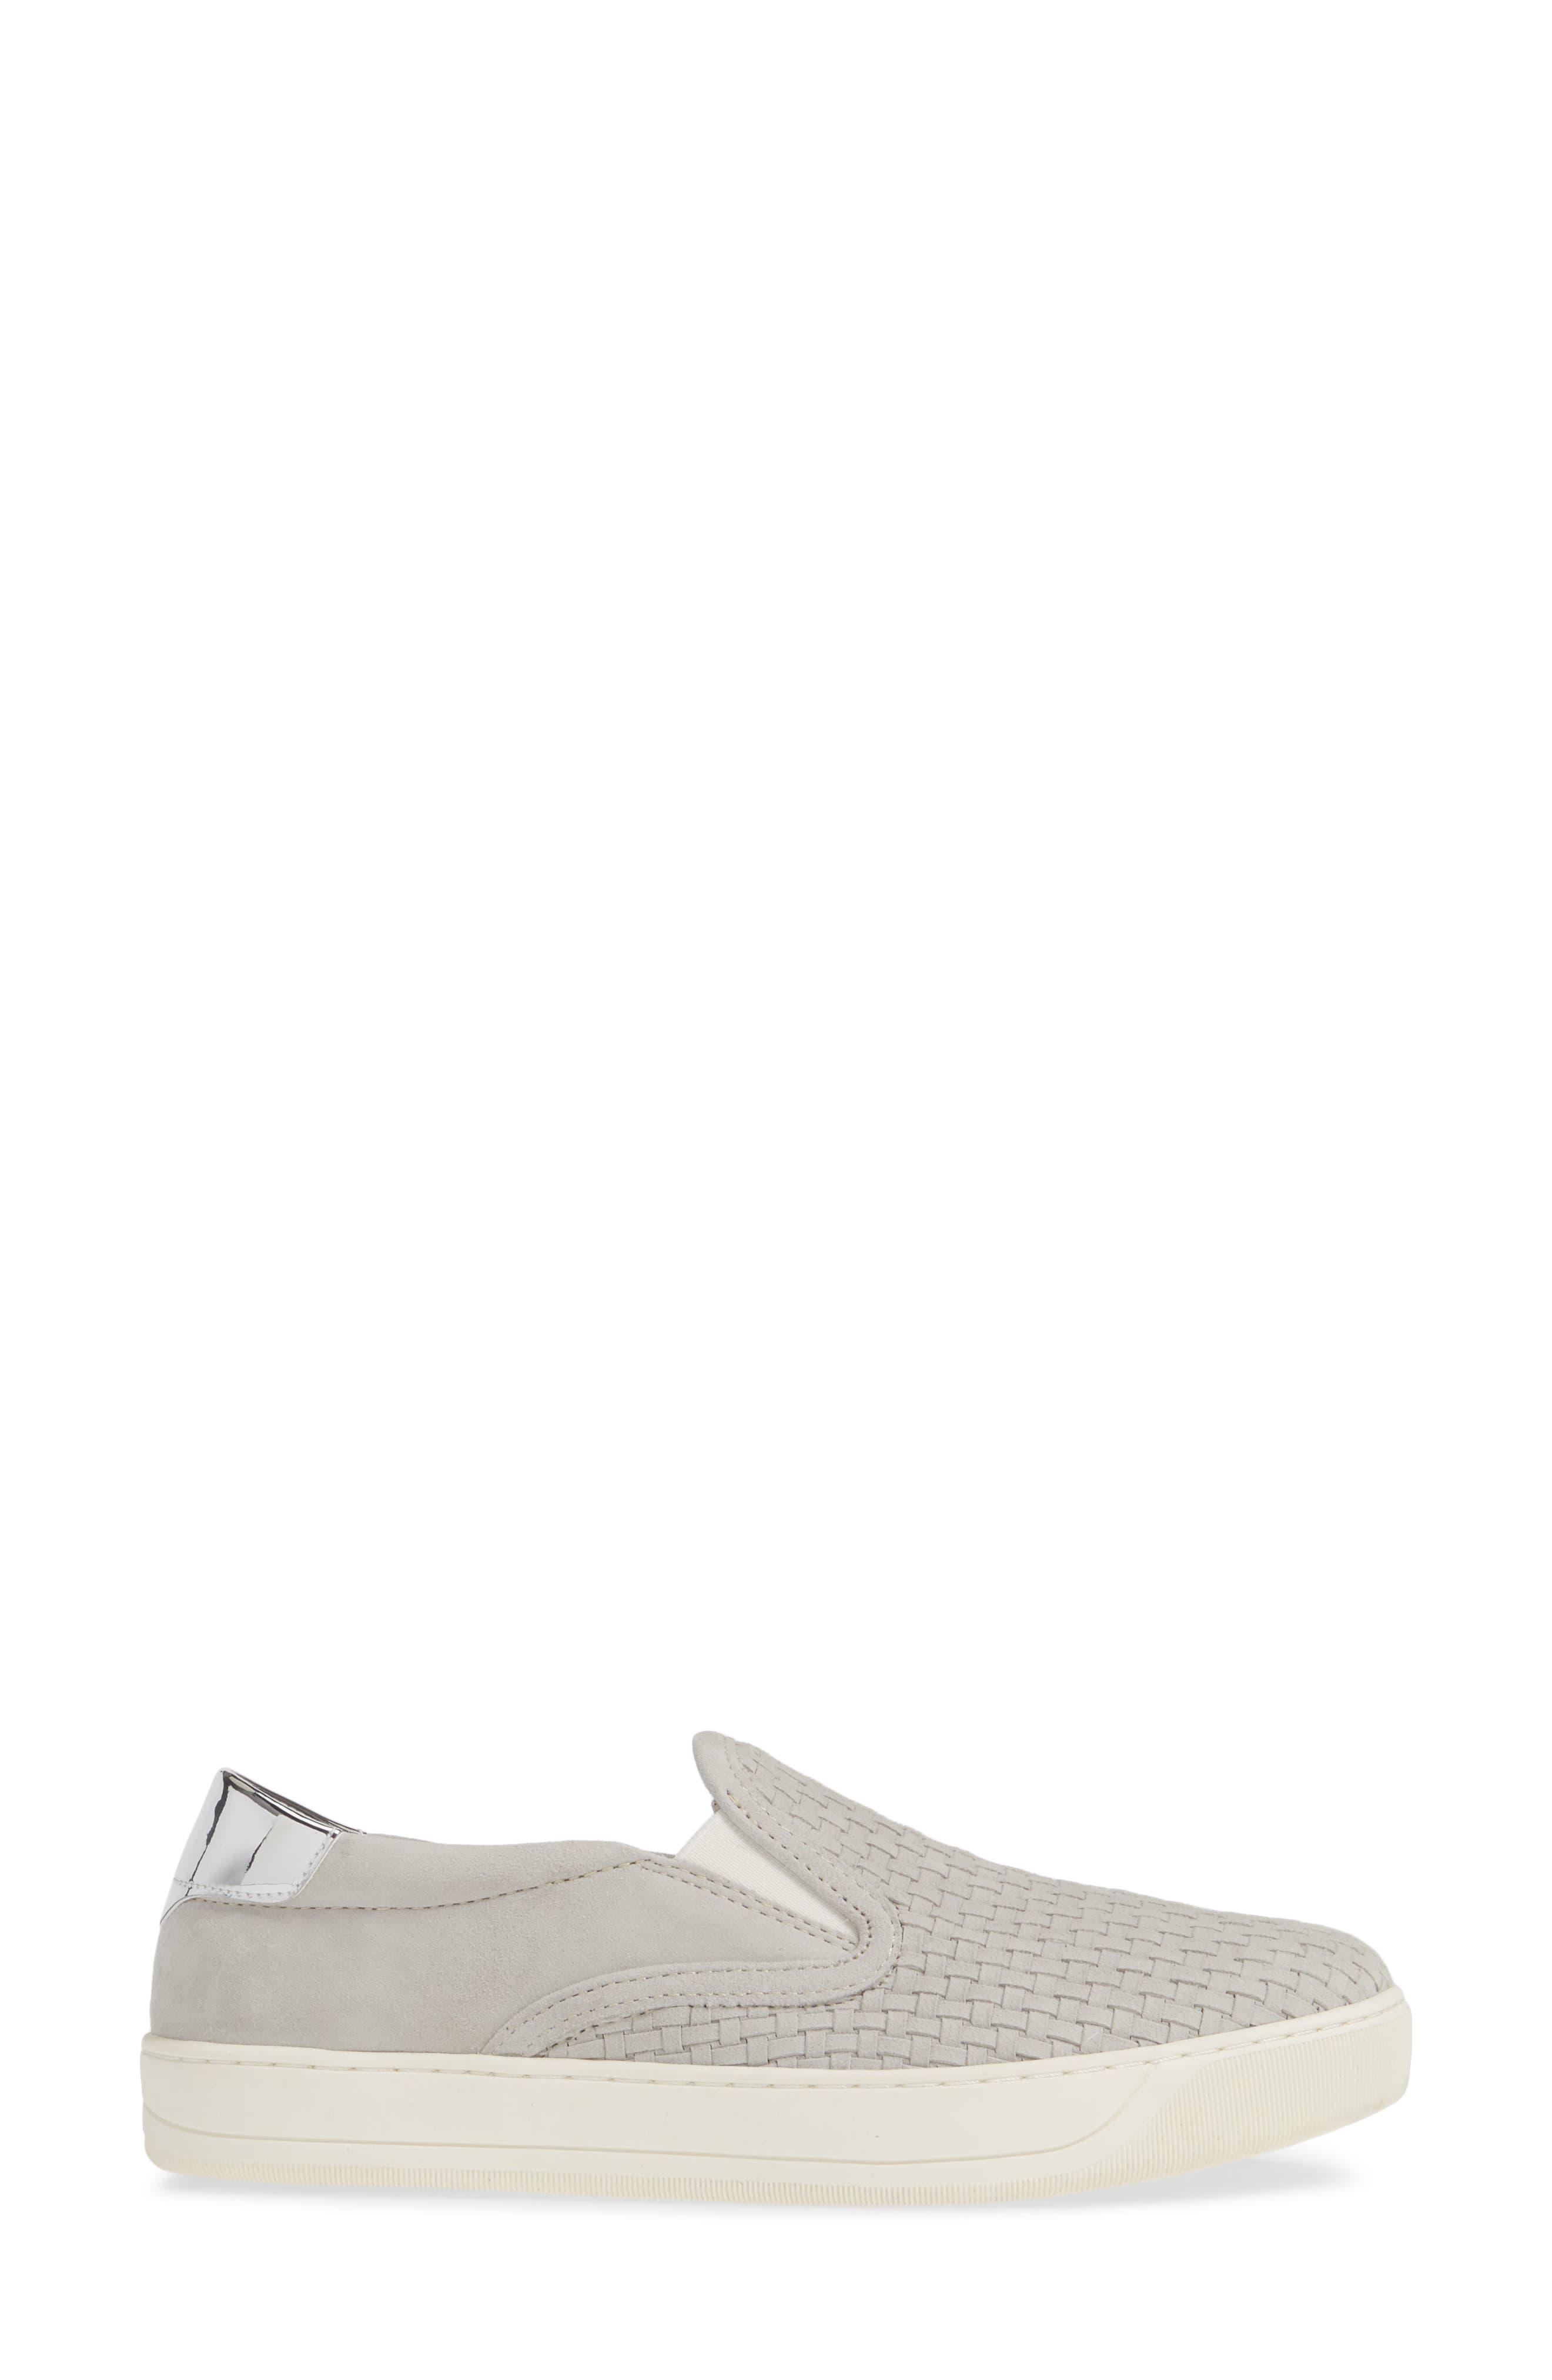 Elaine Woven Slip-On Sneaker,                             Alternate thumbnail 3, color,                             GREY SUEDE